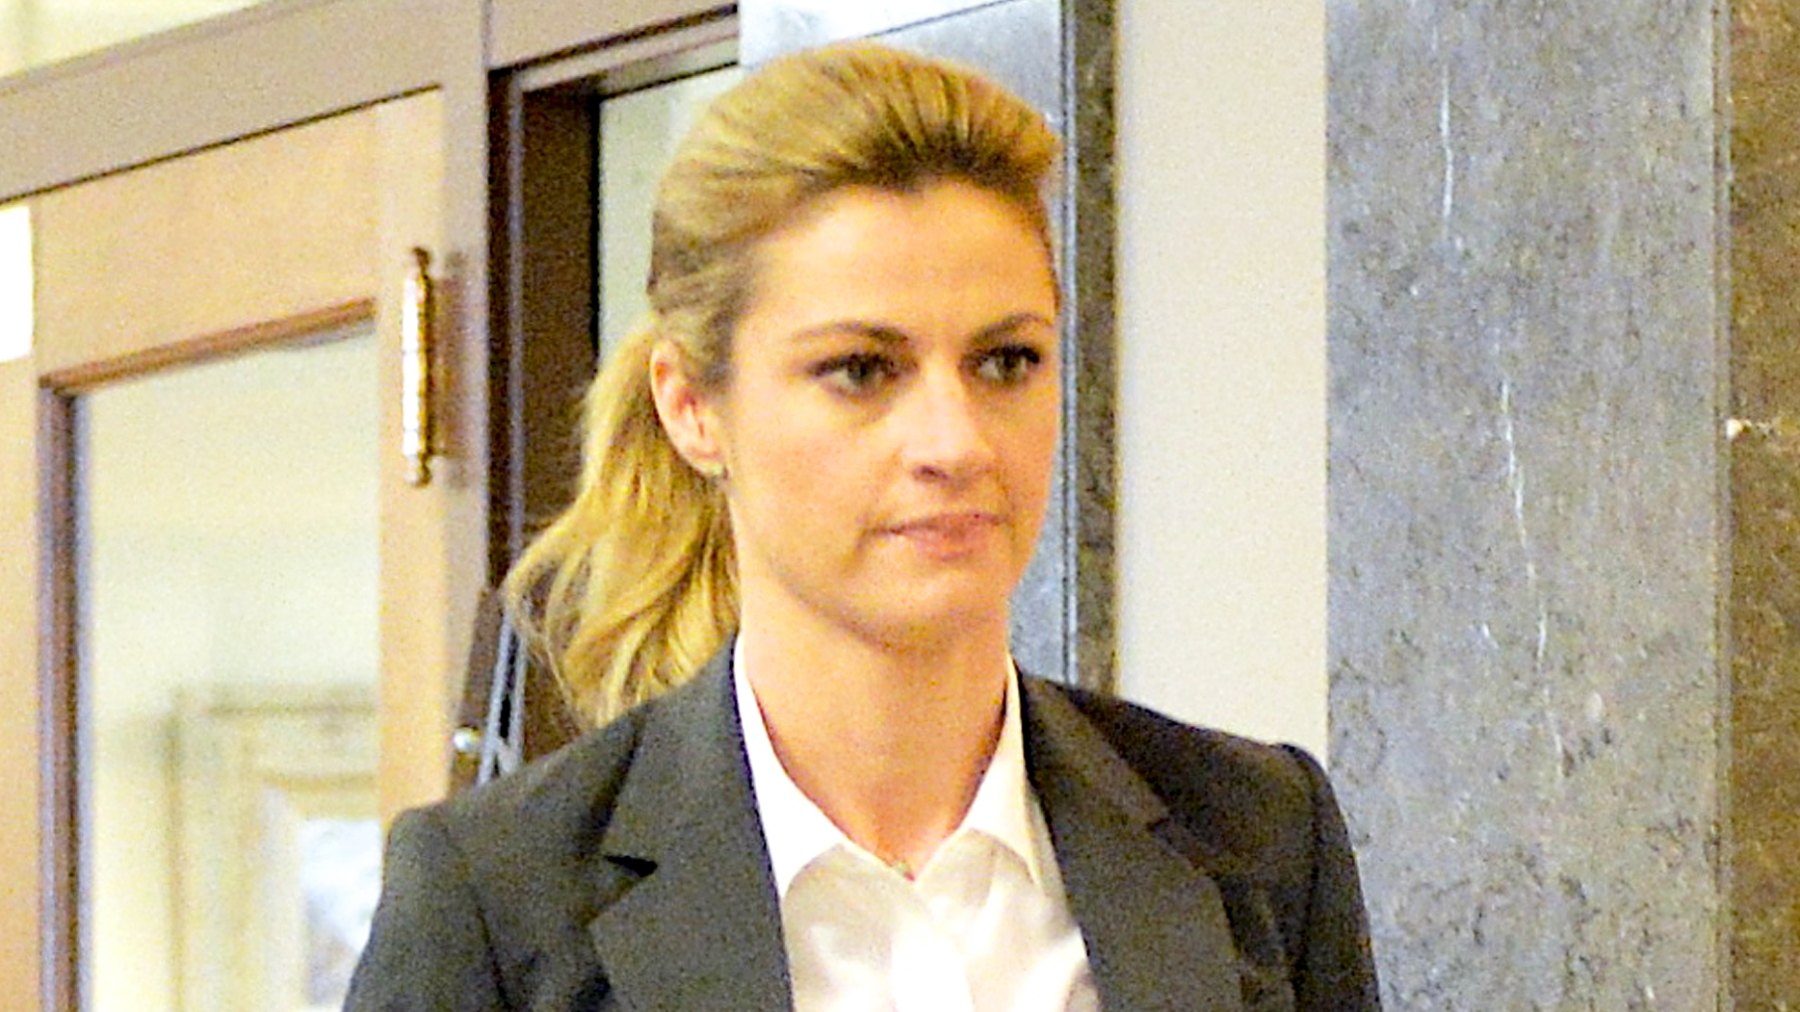 Jury awards TV host Erin Andrews $55 million in lawsuit